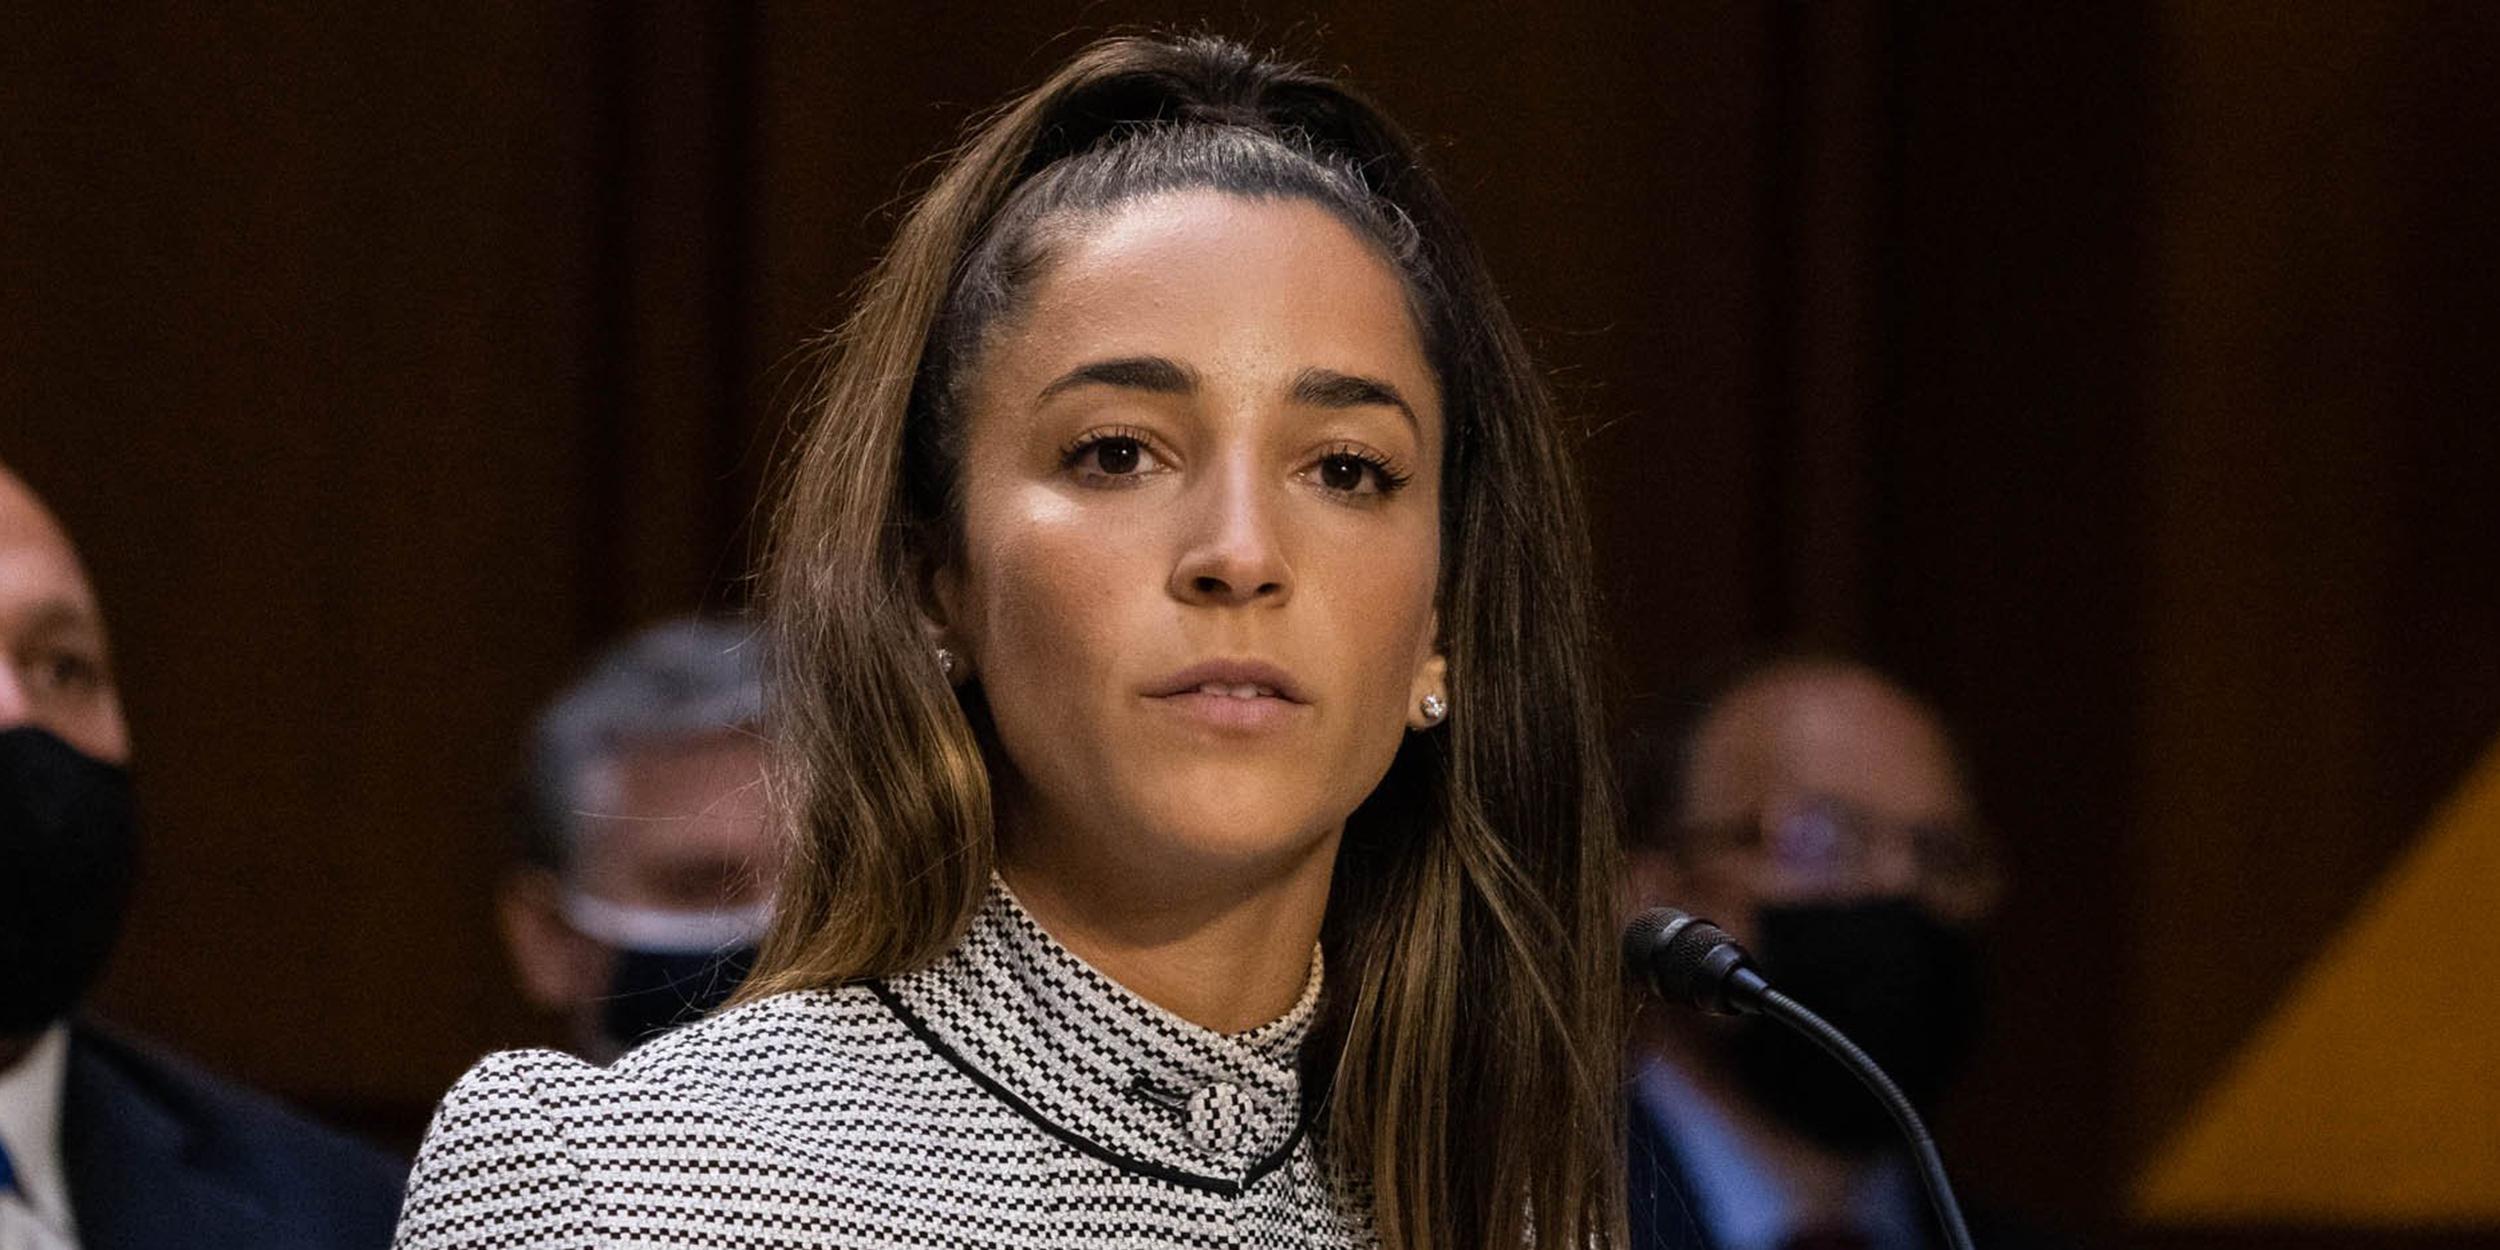 Aly Raisman recounts FBI agent 'diminishing' her abuse when she reported Nassar